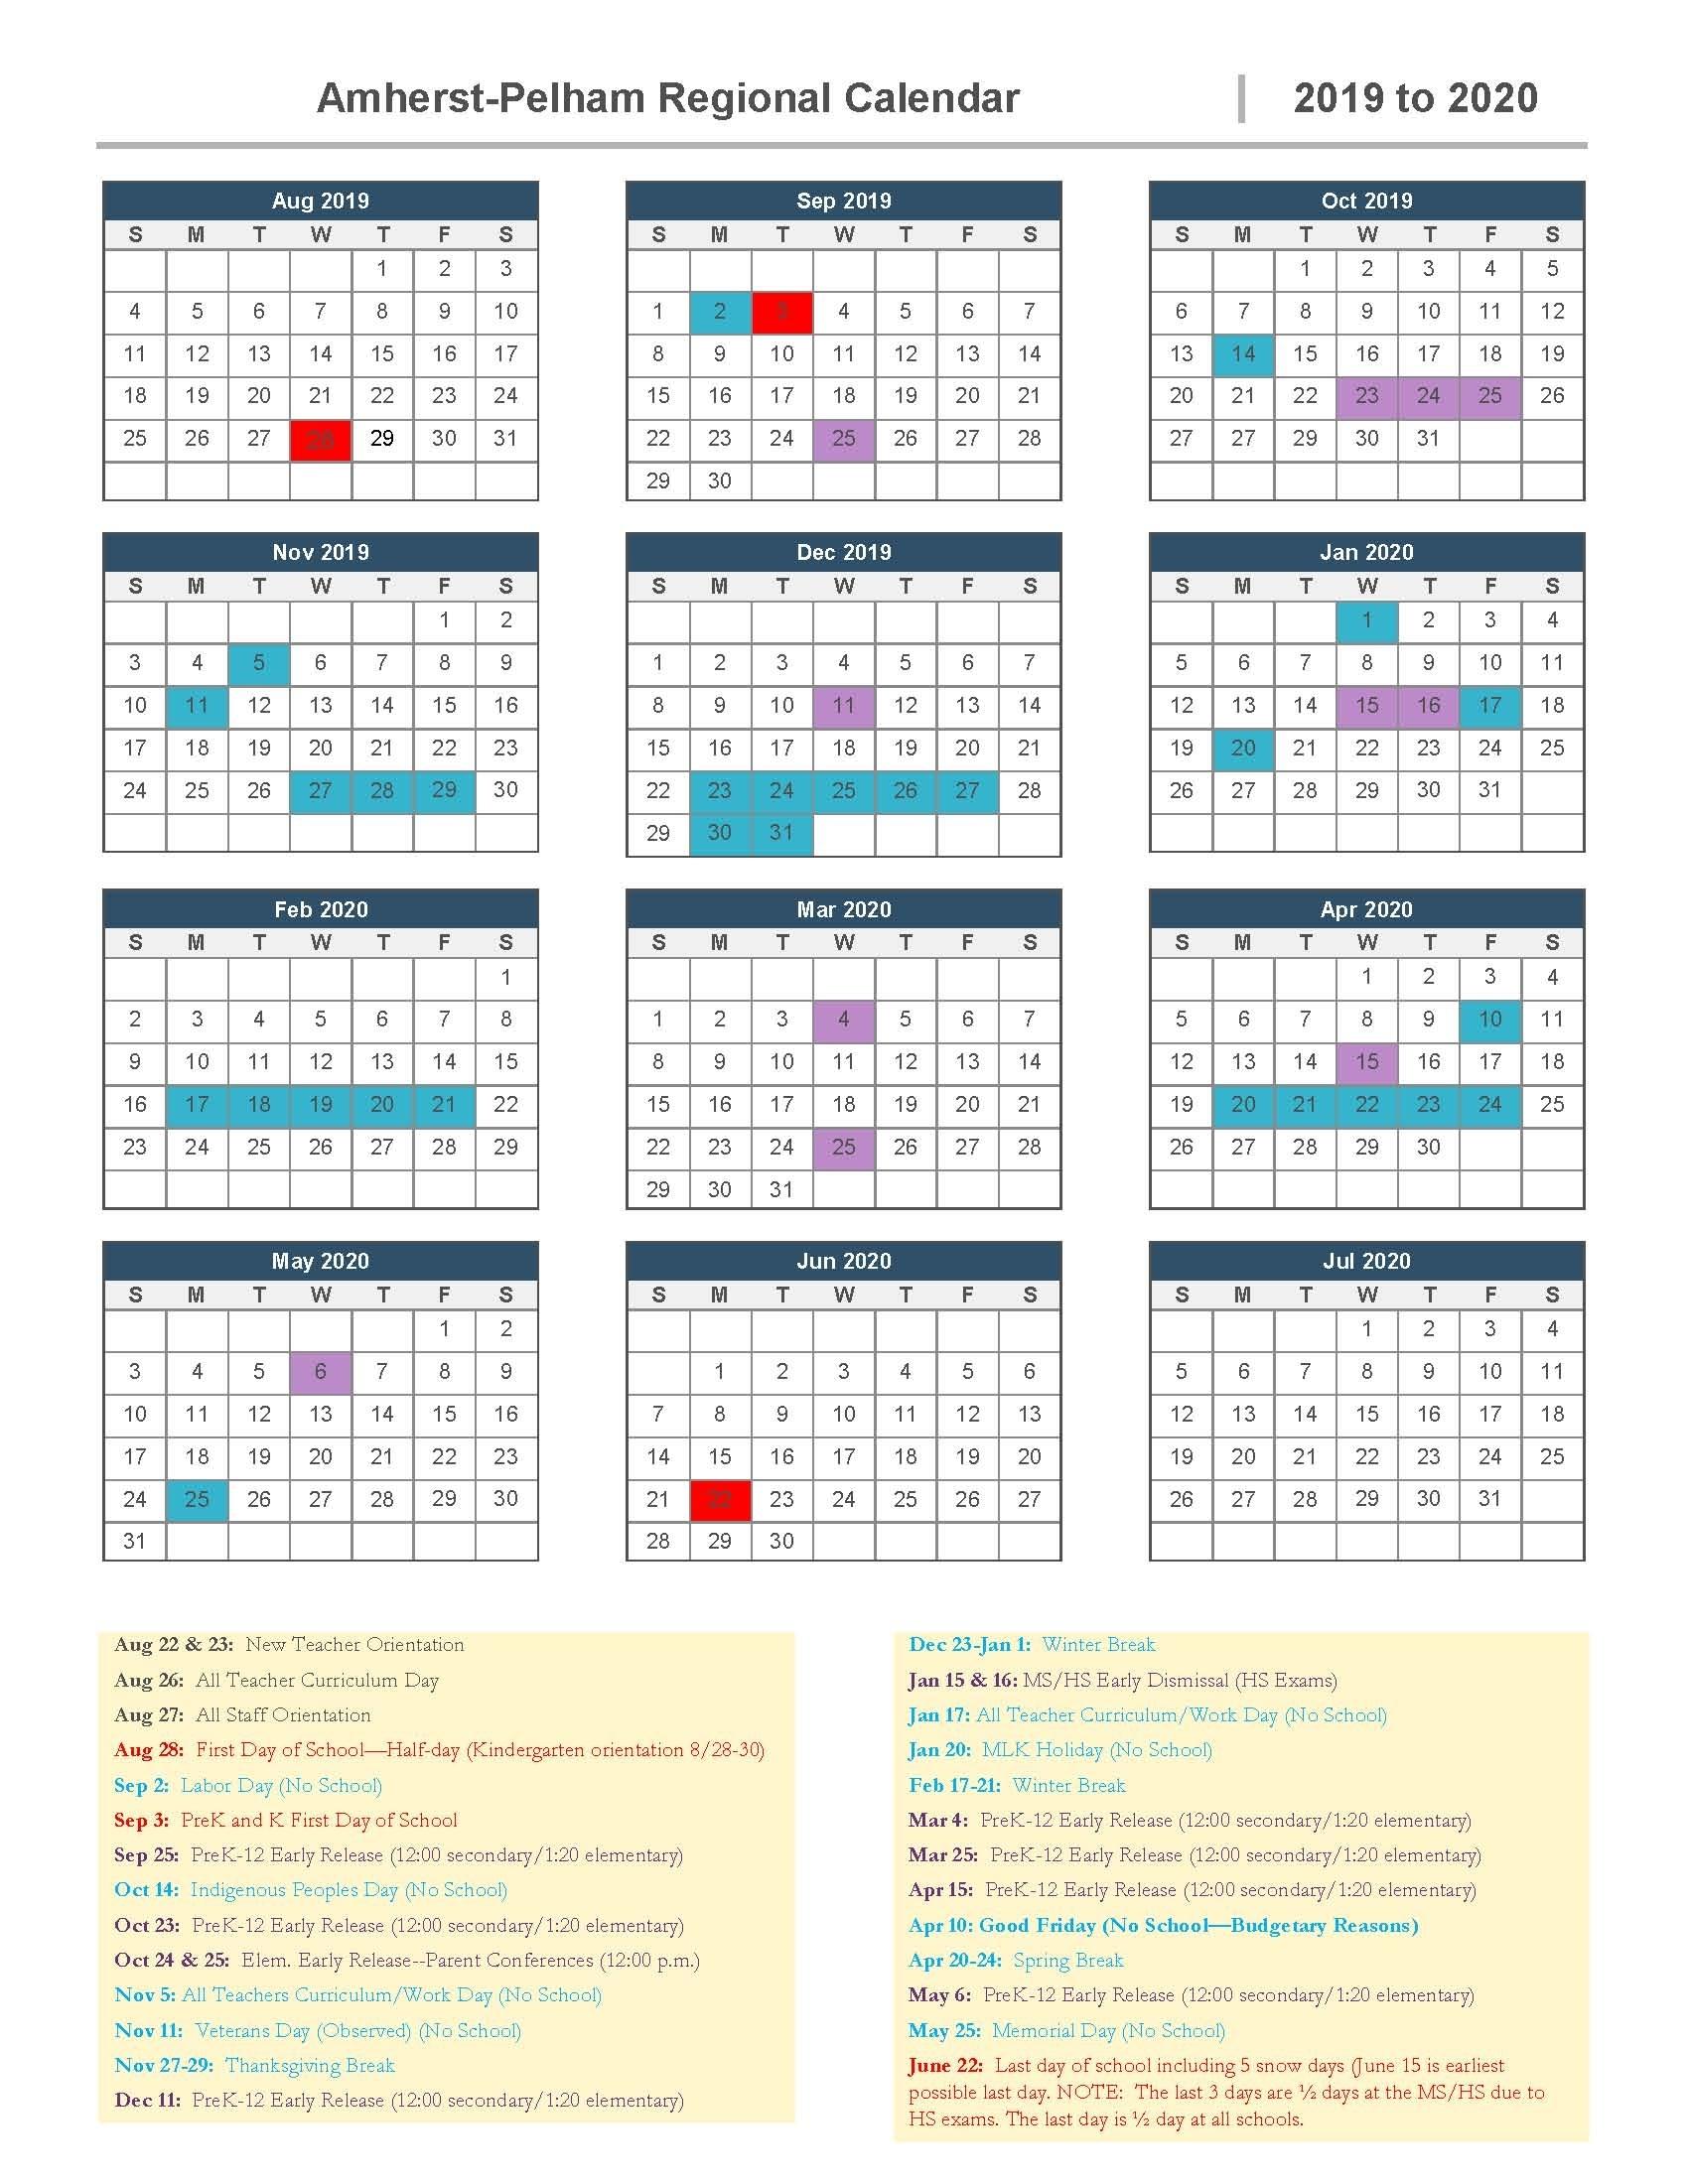 2019-2020 School Calendar Approved | Amherst-Pelham Regional